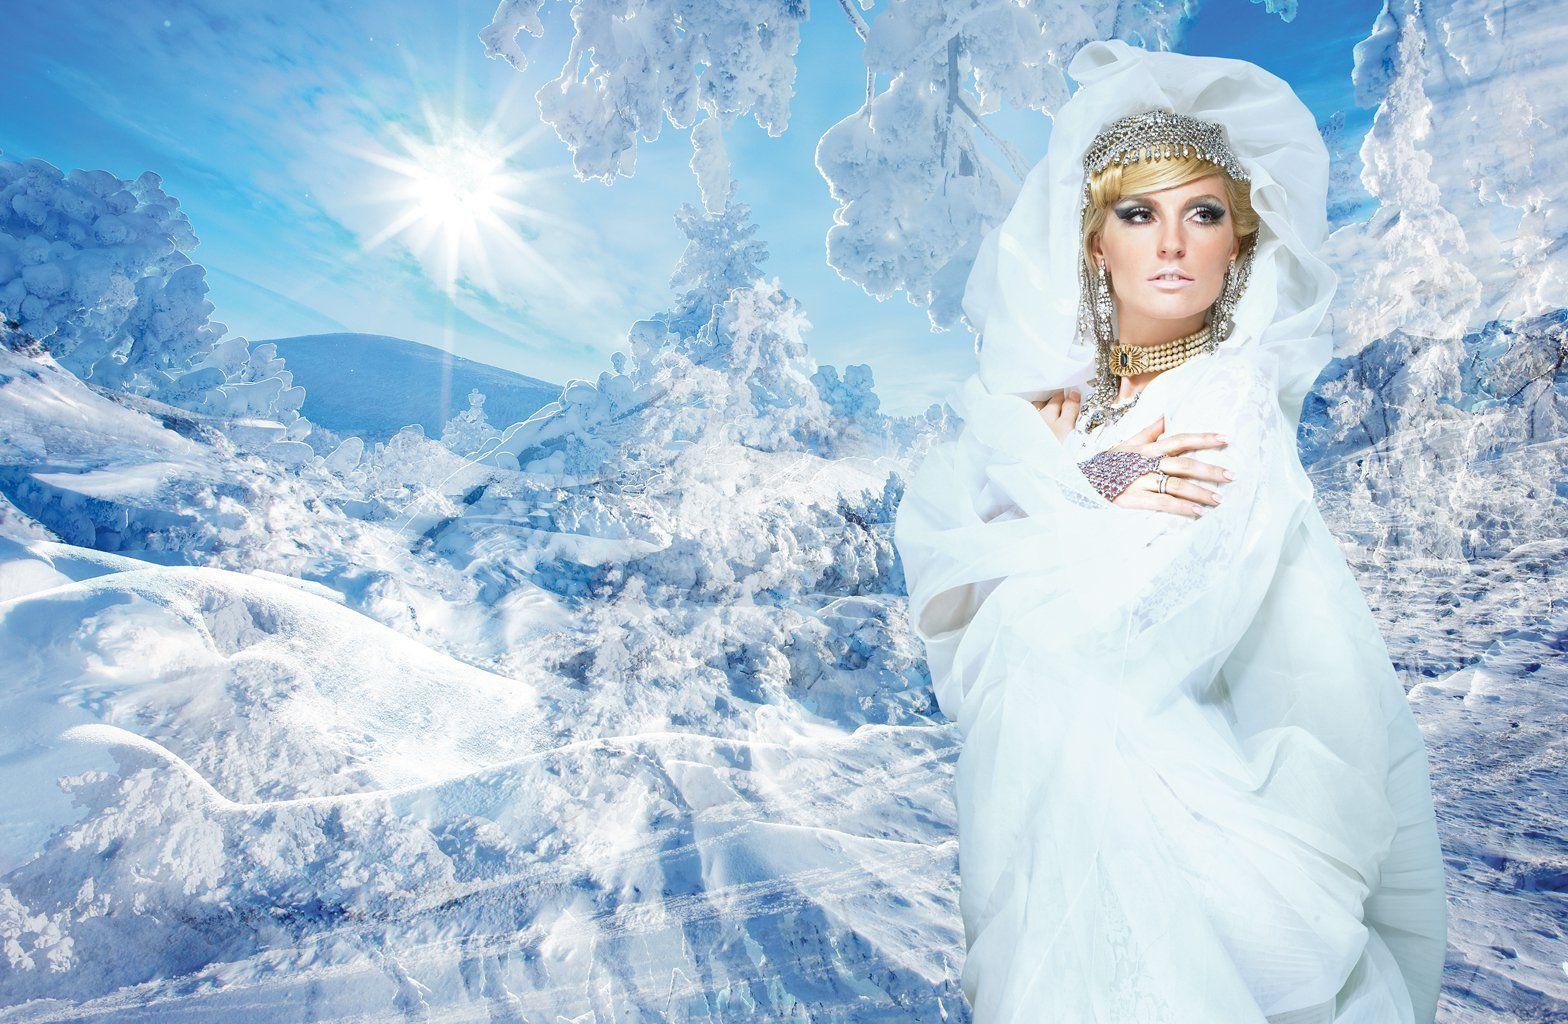 Сайте мой, королева снежная картинки